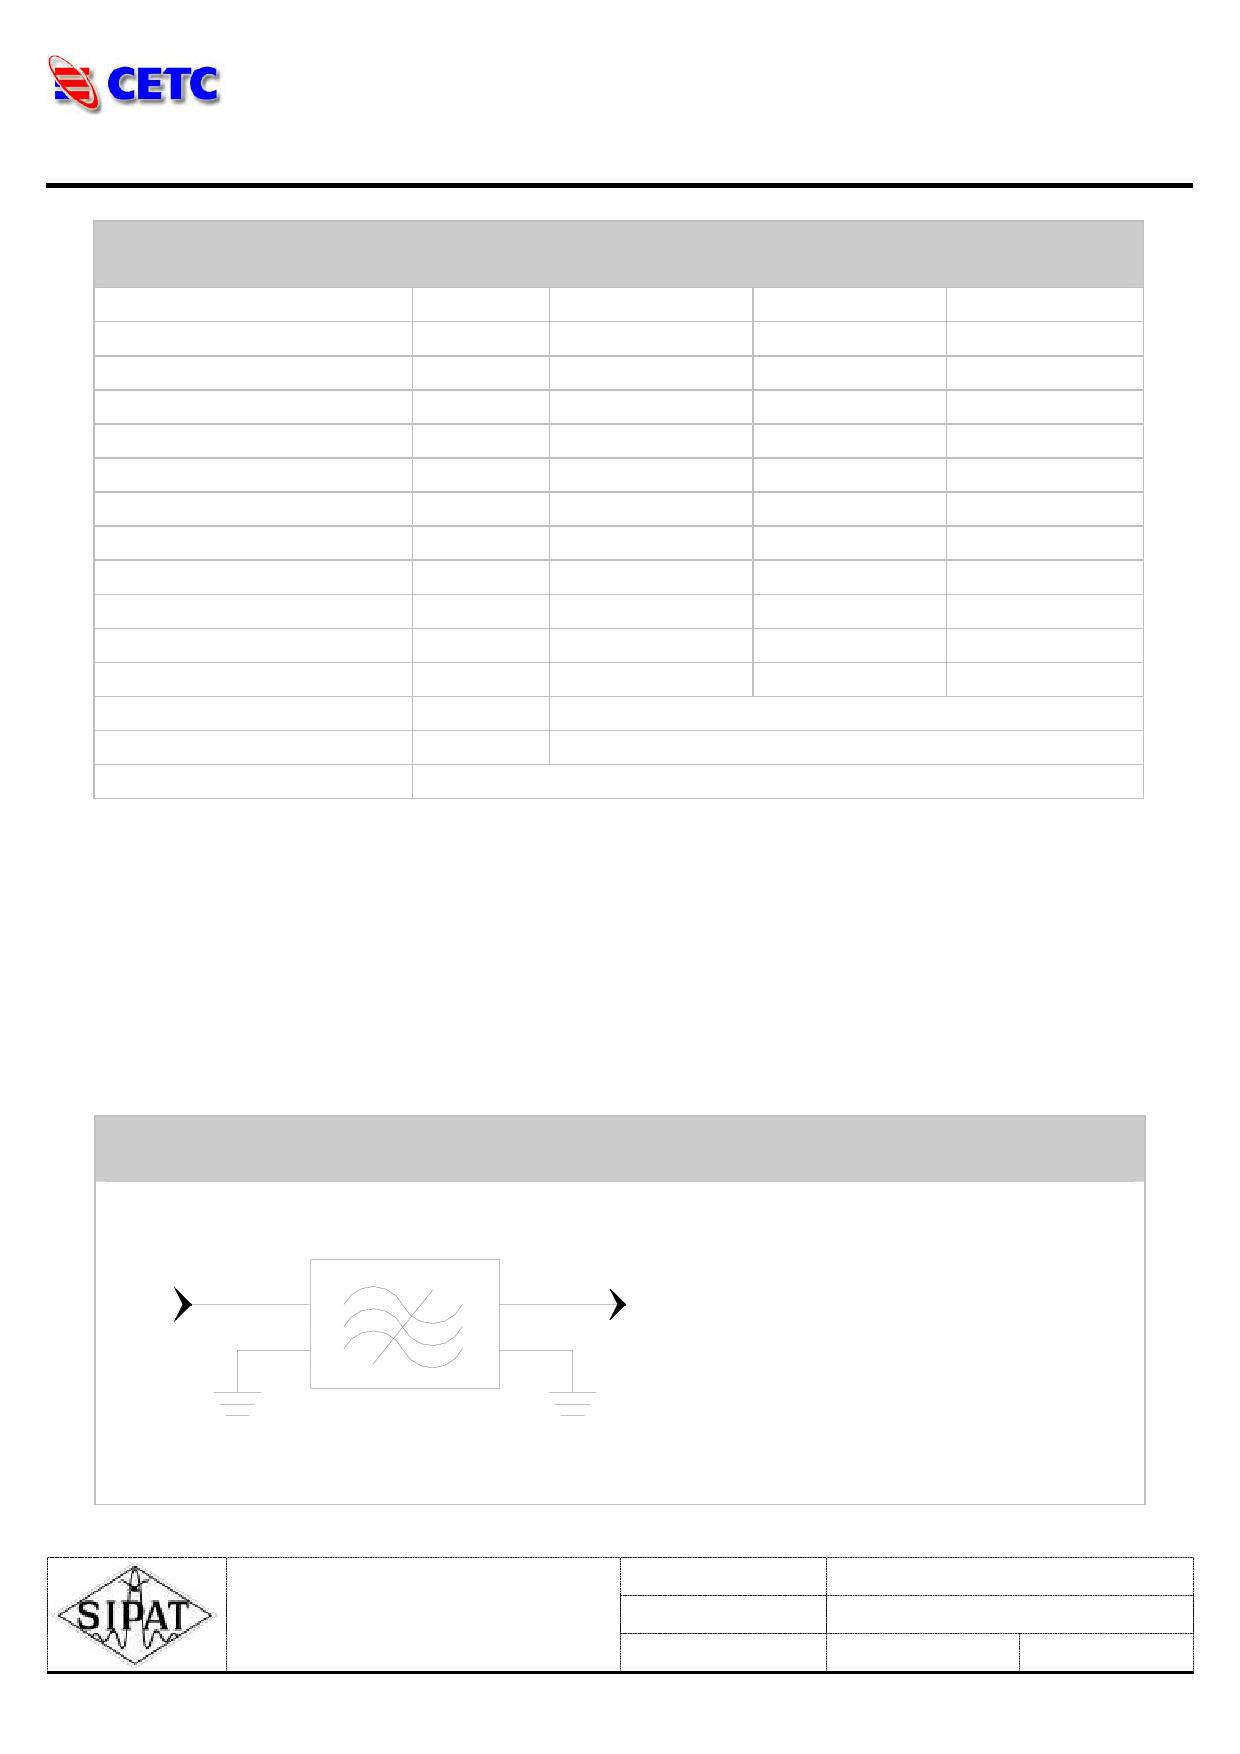 LBN70A21 datasheet